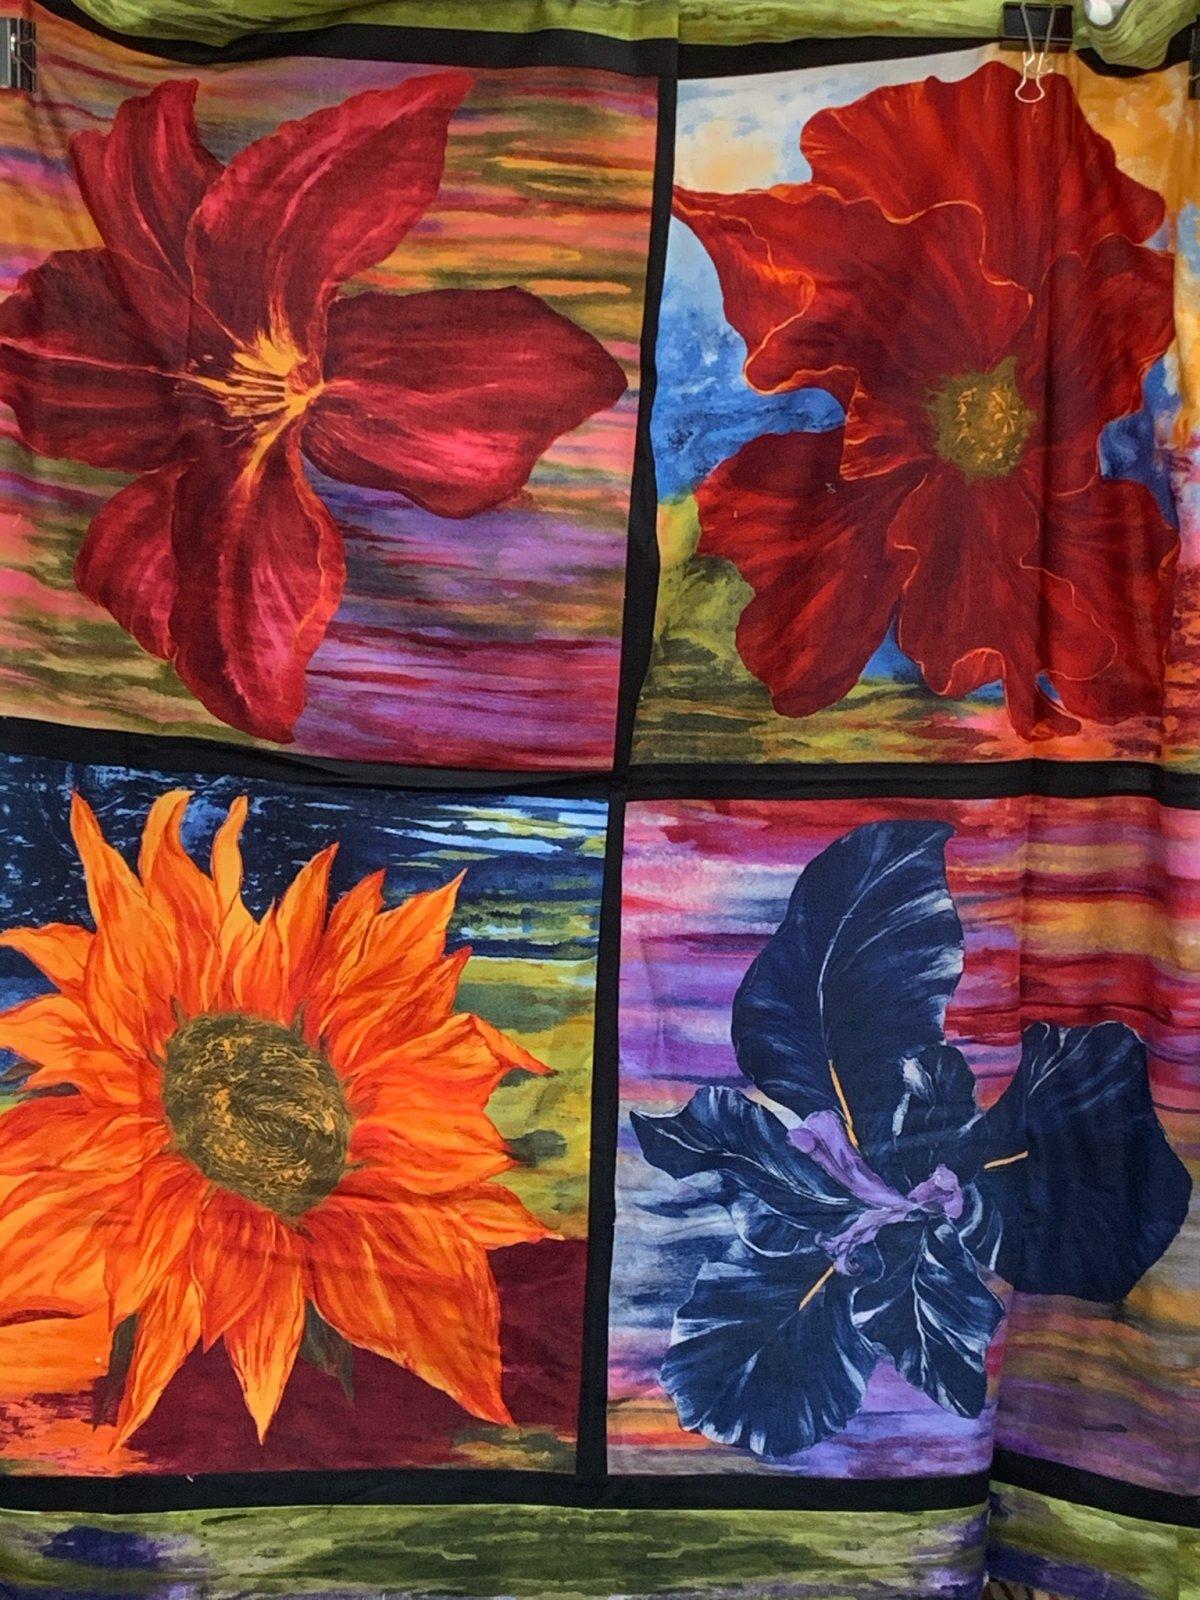 Frond Flowers Quilt Top Measures 52 x 52